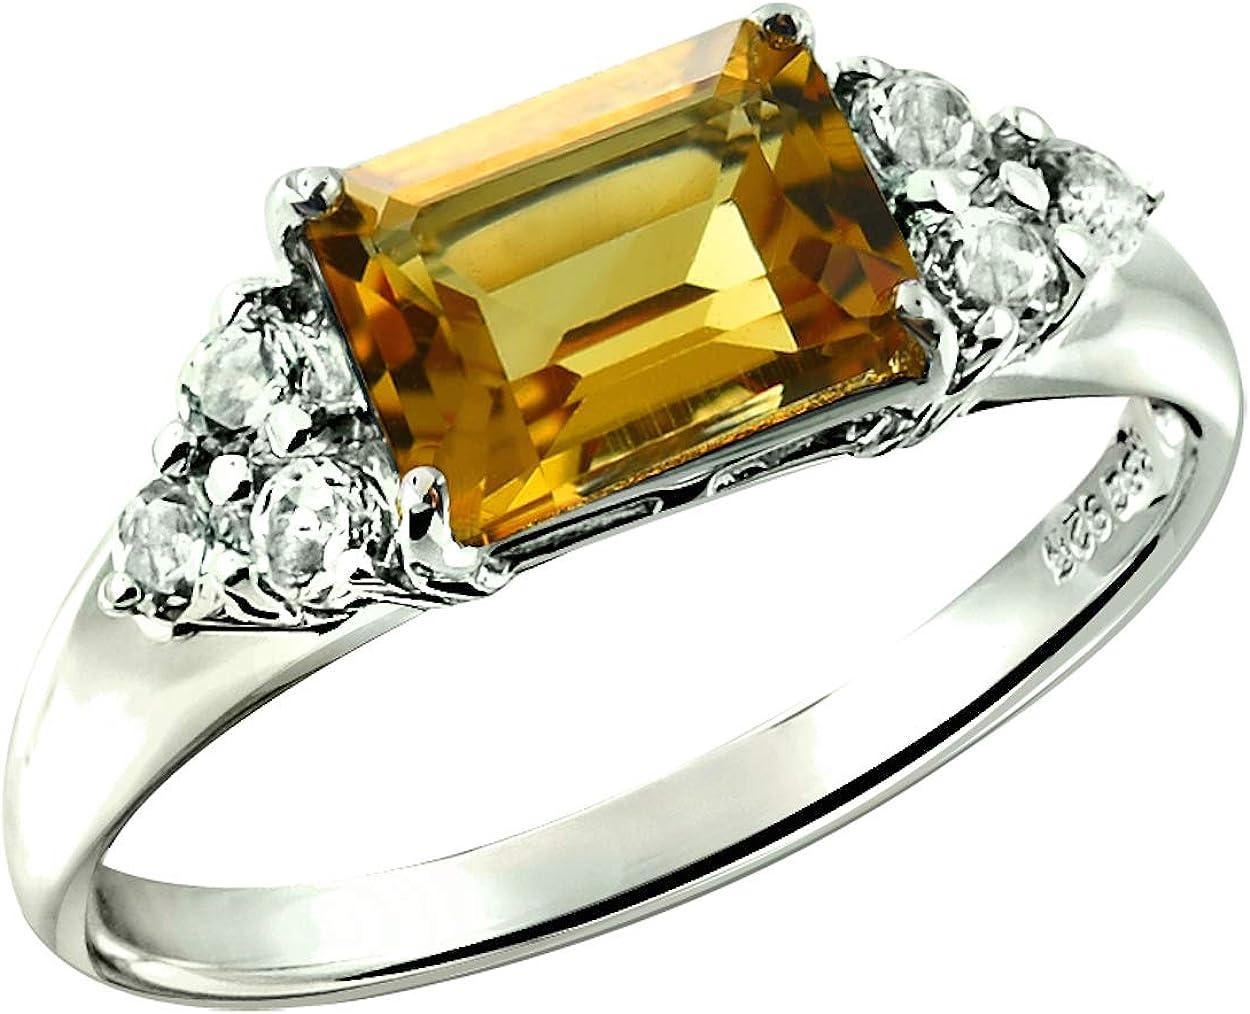 RB Gems Sterling Silver 925 Max 76% OFF Reservation Gemstone 2. Genuine Emerald-Cut Ring